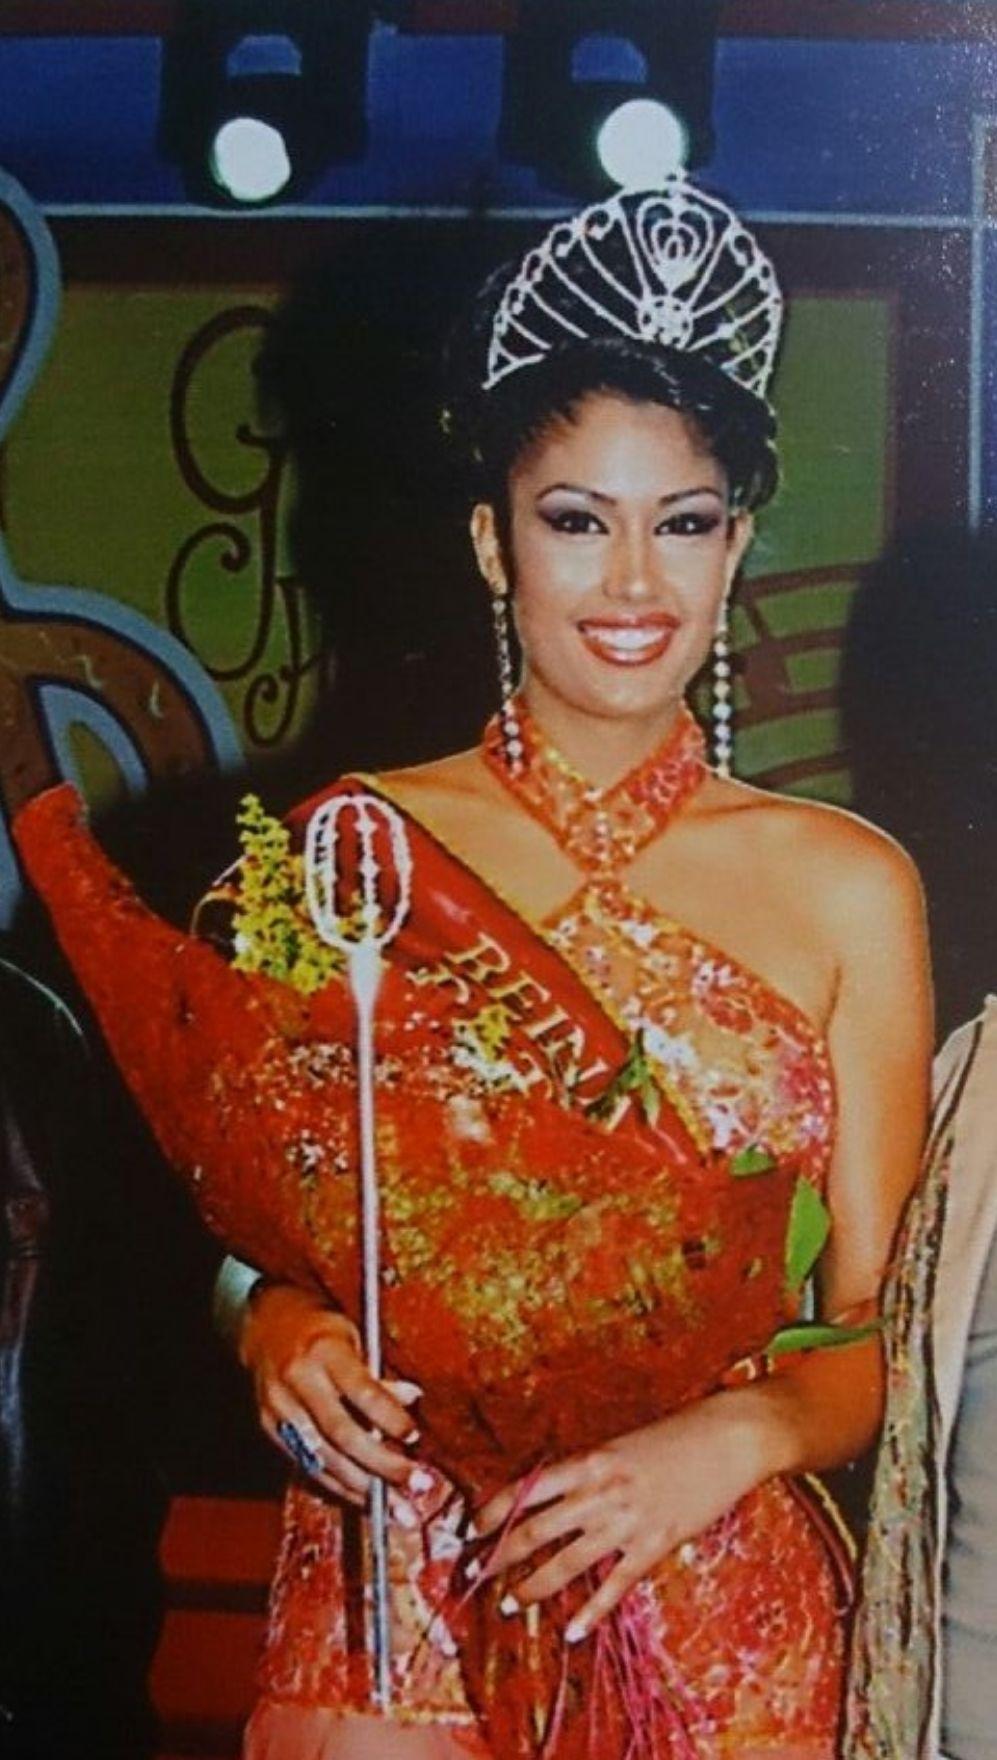 patricia yurena rodriguez, miss espana 2008/2013, 1st runner-up de miss universe 2013. - Página 4 13841911